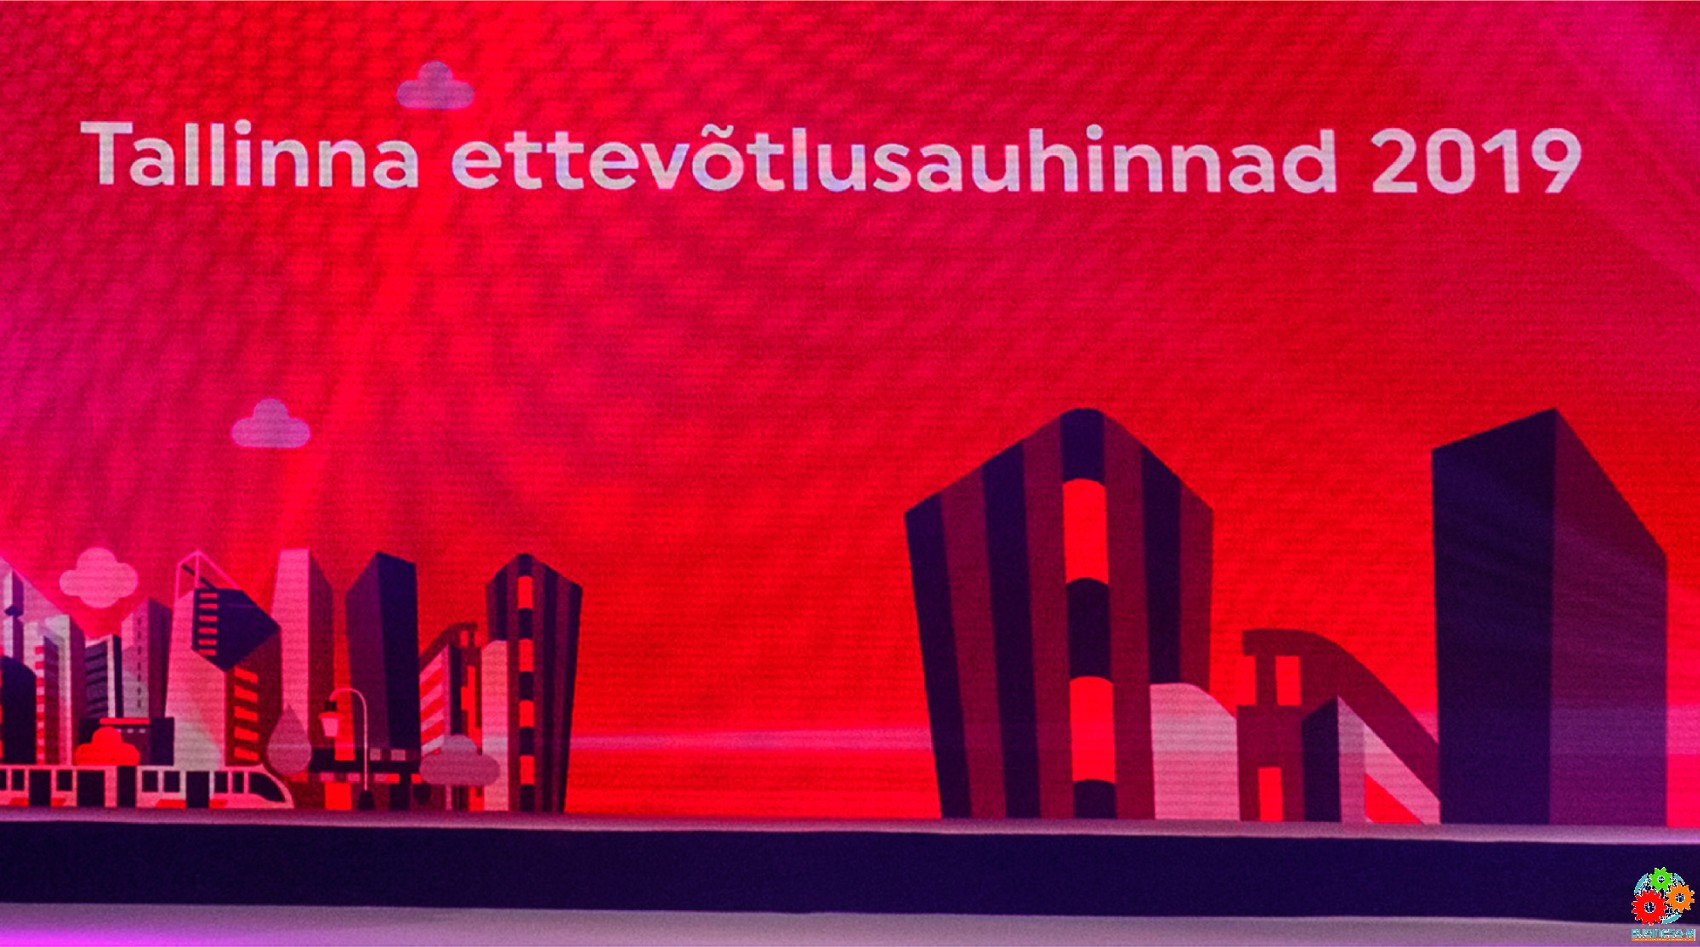 Таллинн наградил предпринимателей 2019 года